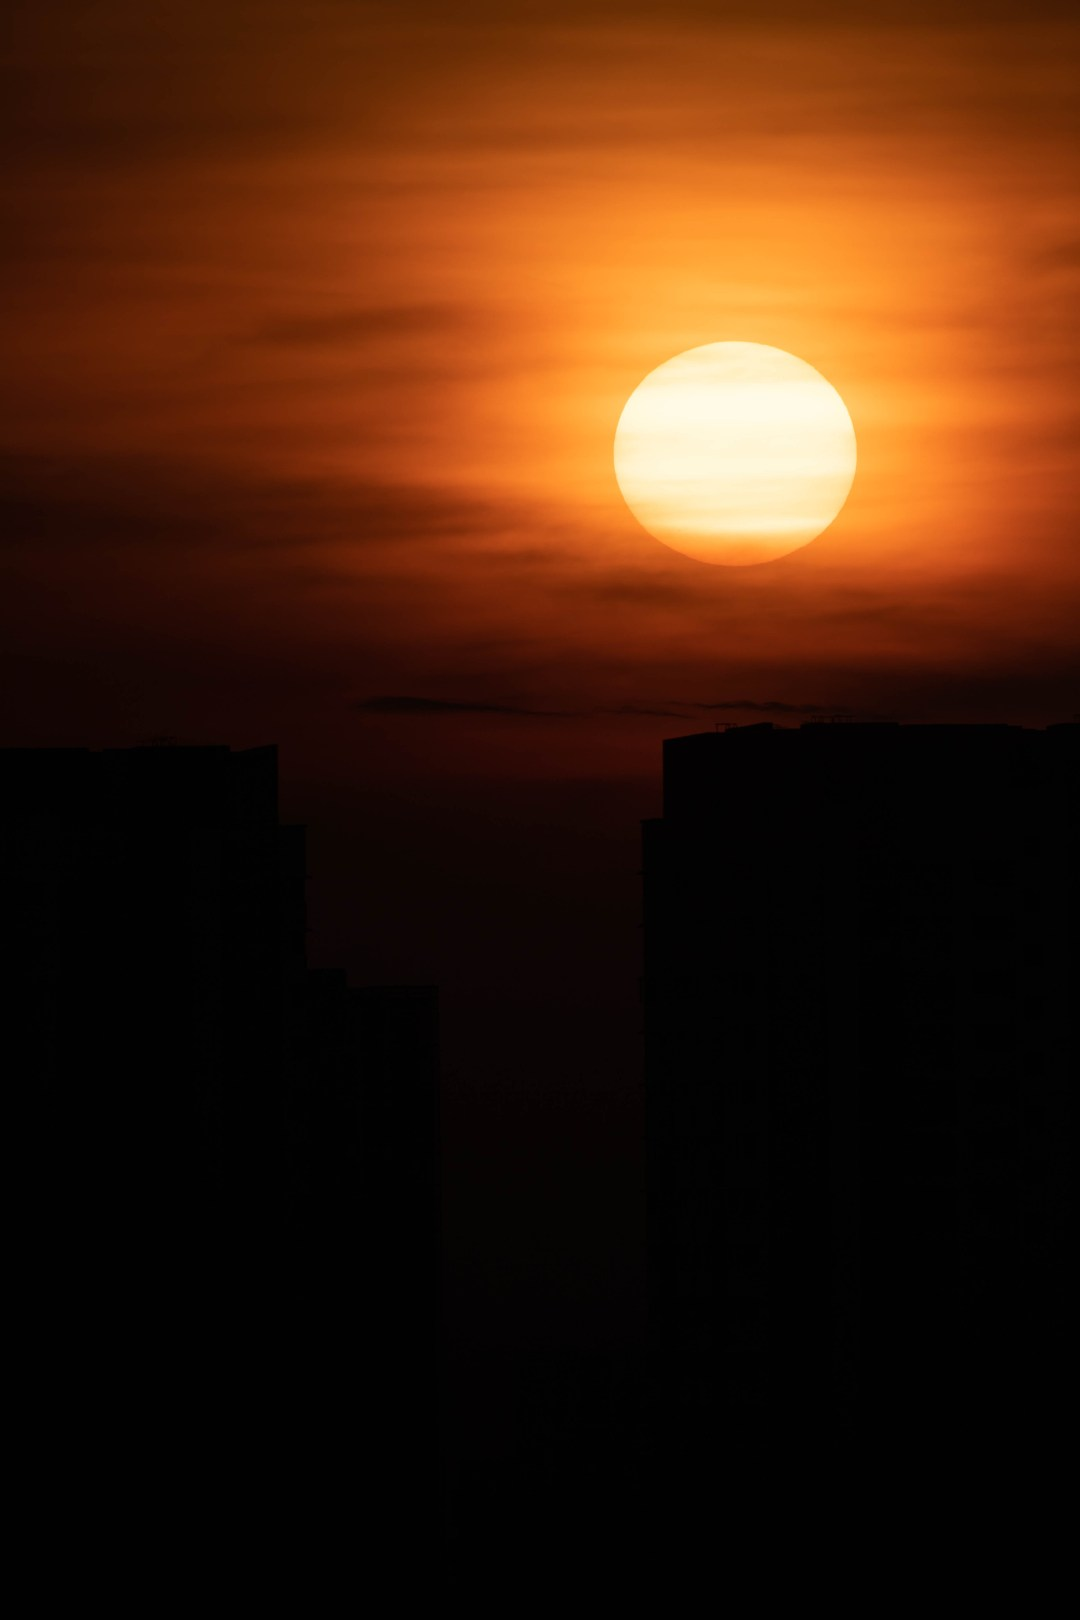 Moon Wallpaper Hd Orange Sky Sun Light Sunset And Landscape Hd Photo By